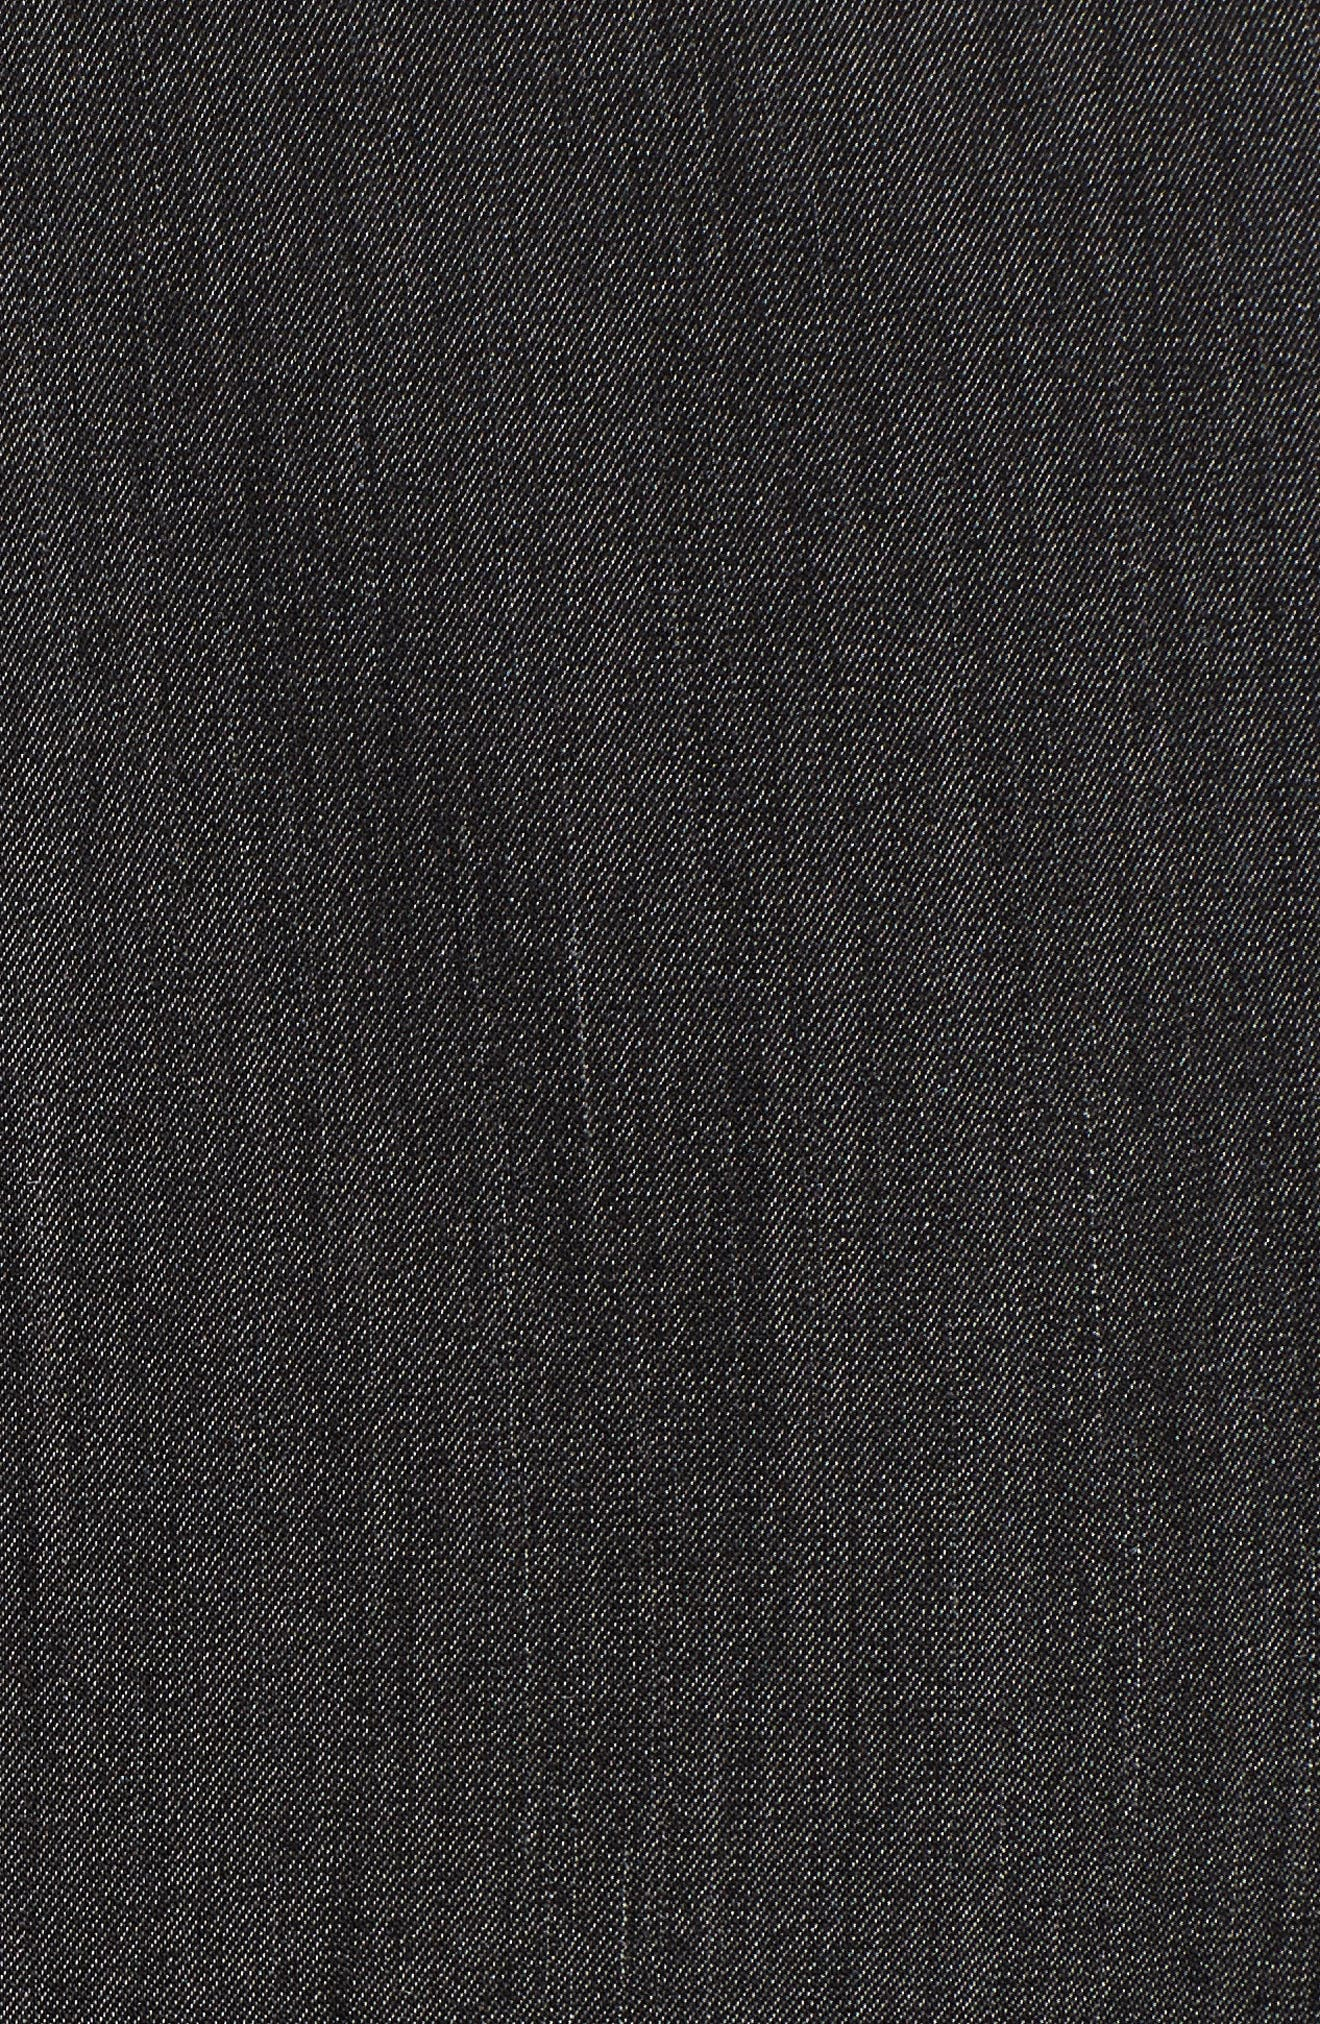 Notch Collar Stretch Denim Dress,                             Alternate thumbnail 9, color,